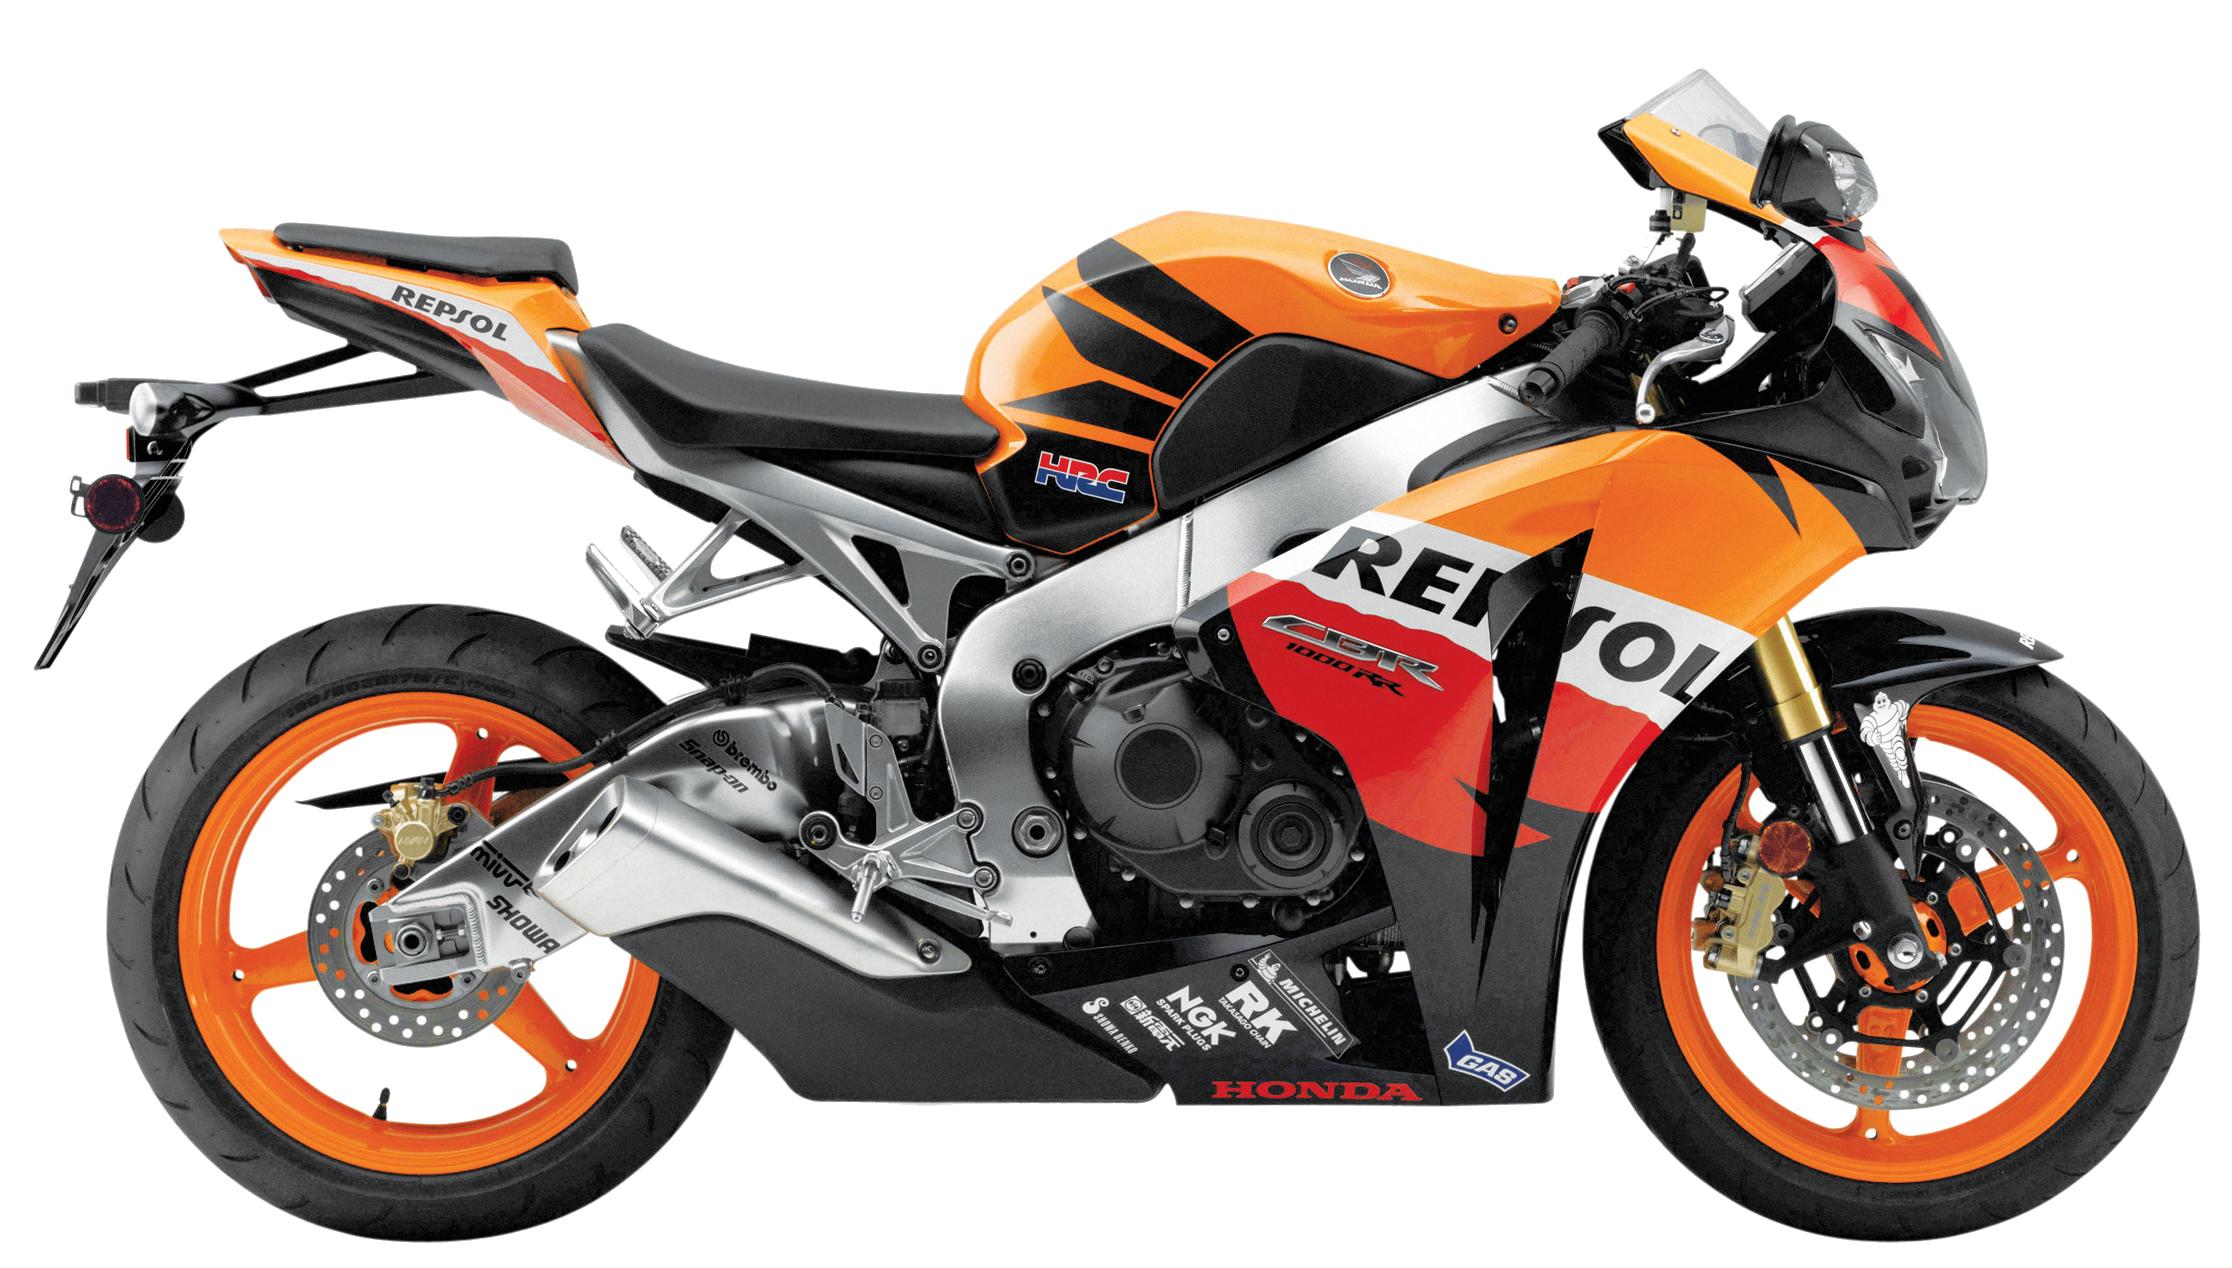 Motorbike HD PNG - 90550